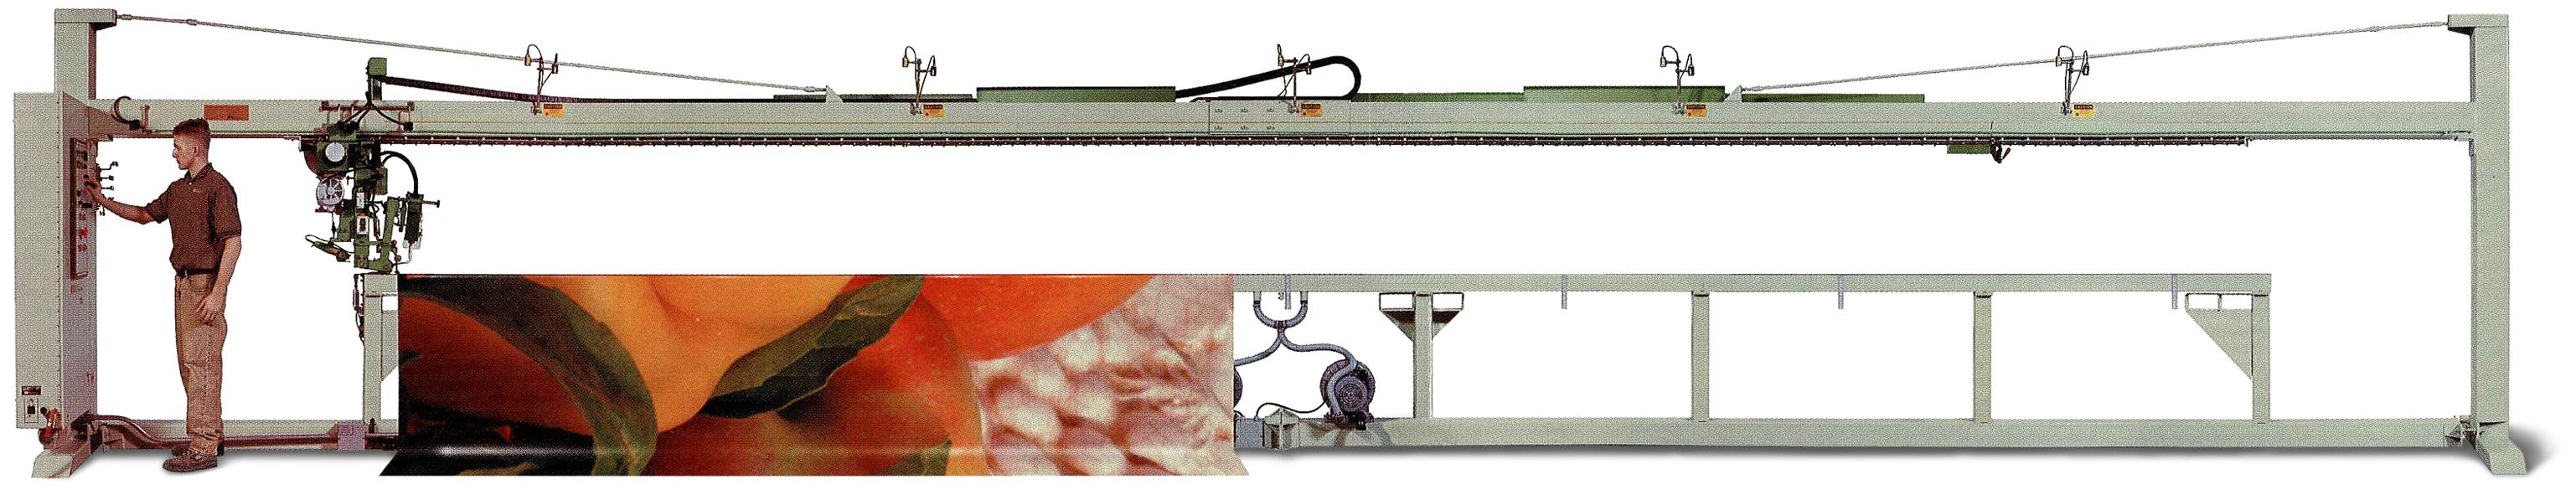 DualVee滚轮导轨在布料焊接机中的应用